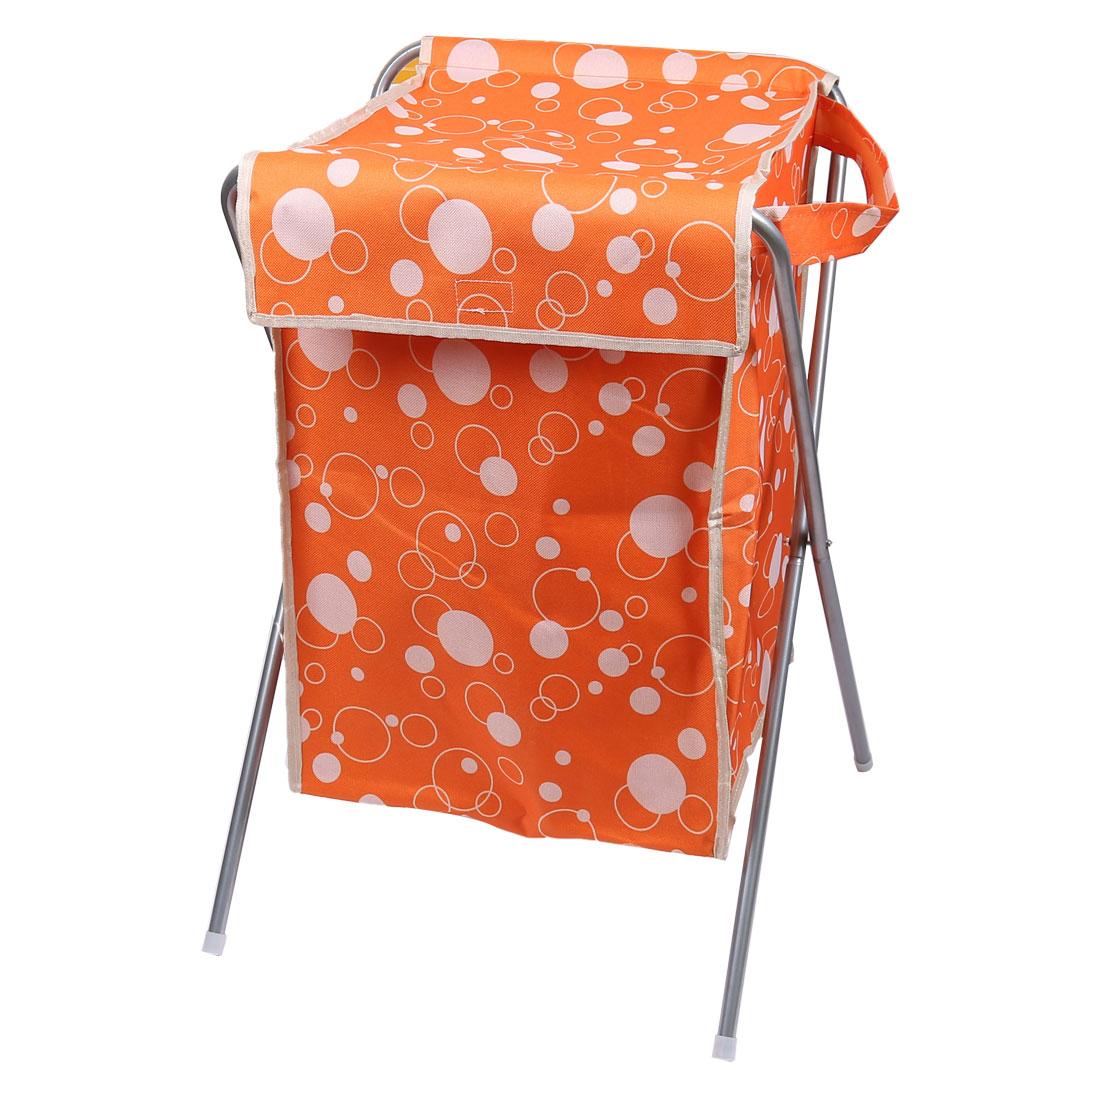 Washing Clothes Linen Laundry Basket Hamper Bag Bags Storage